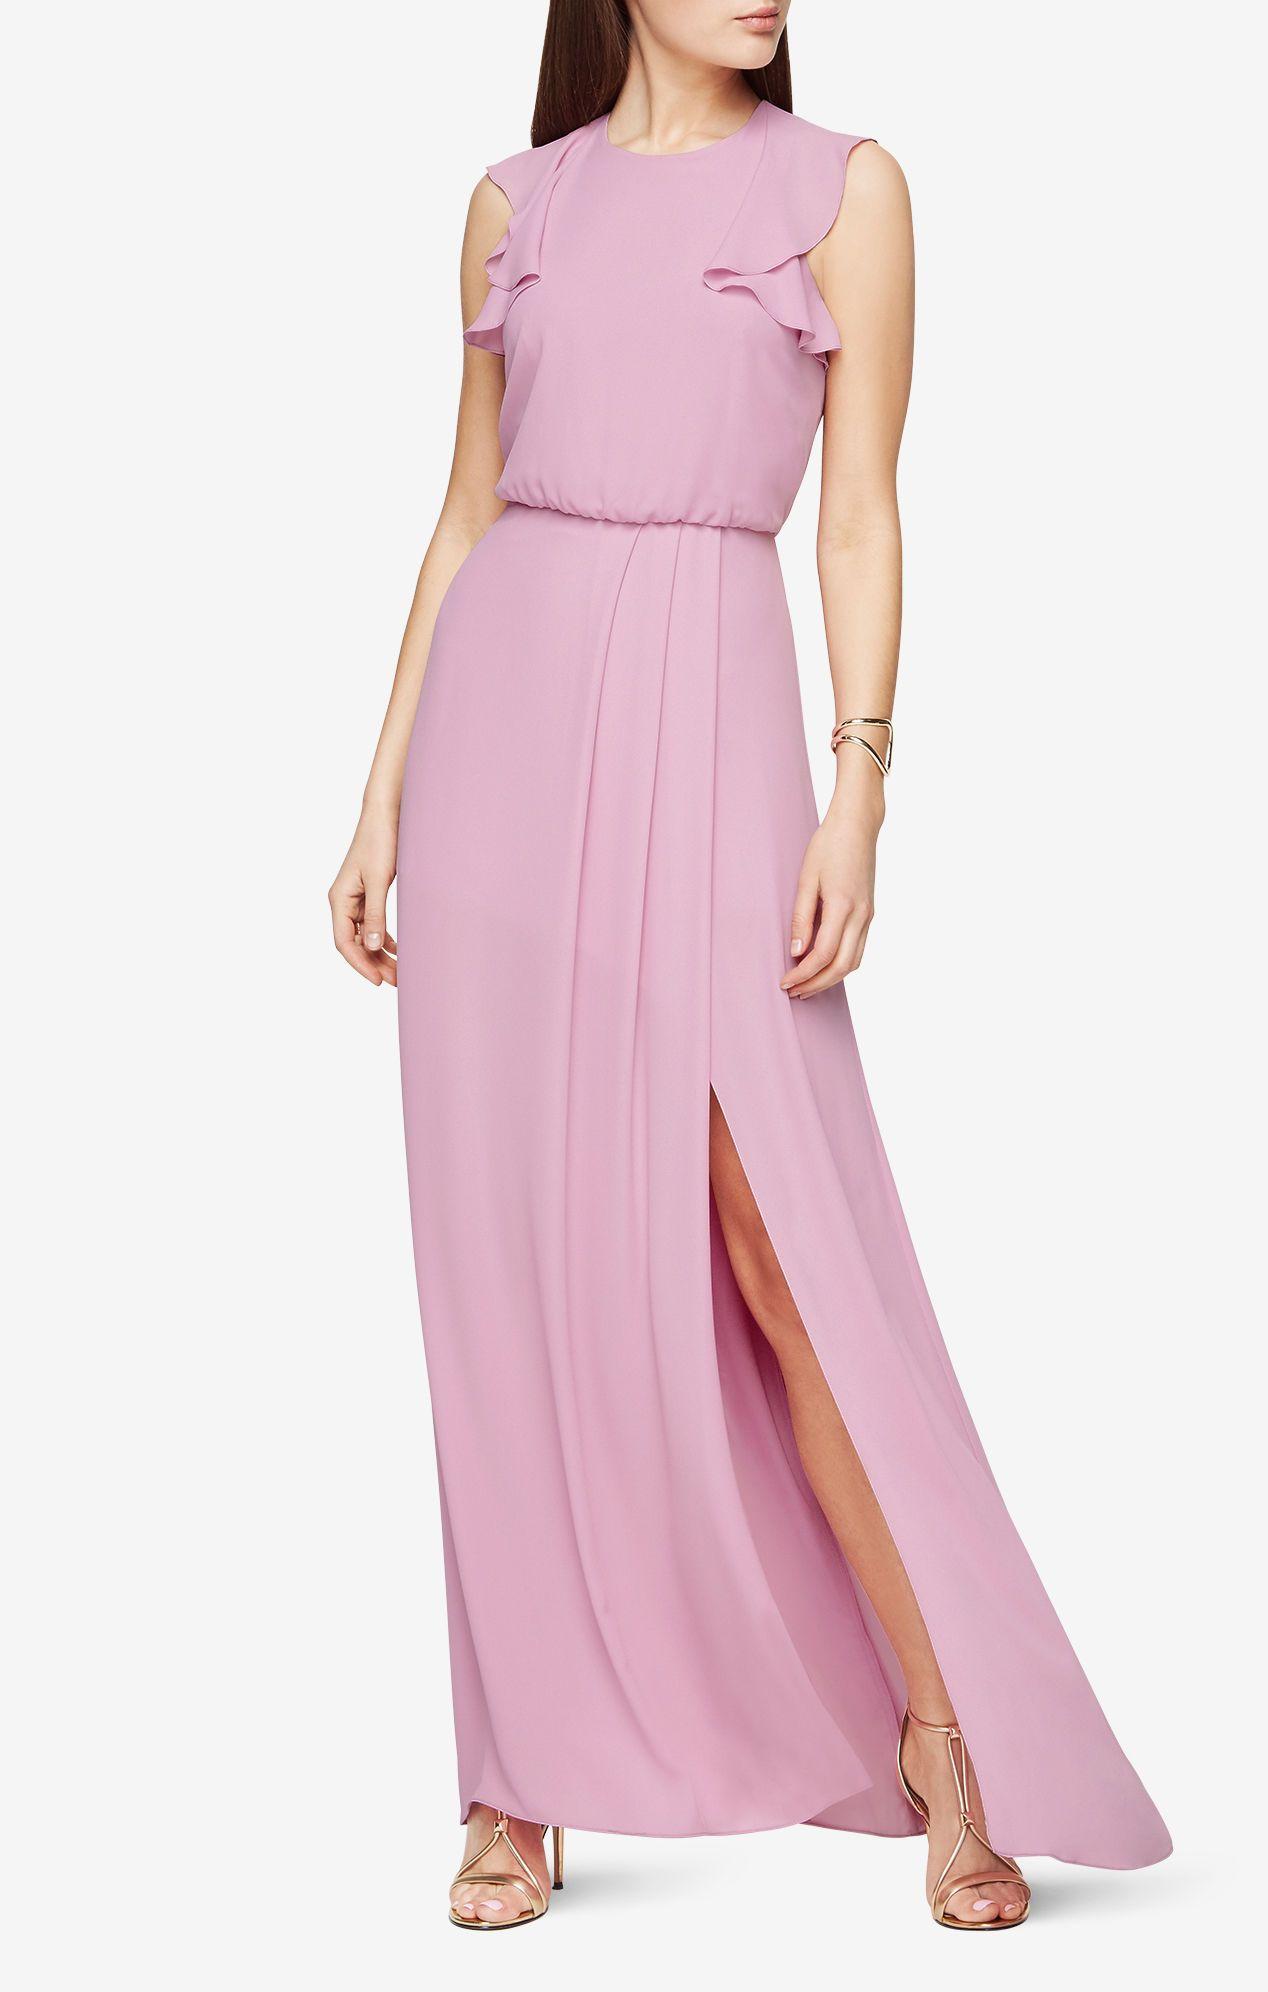 Angelika Ruffled Gown | Semi-formal/Formal Dresses | Pinterest